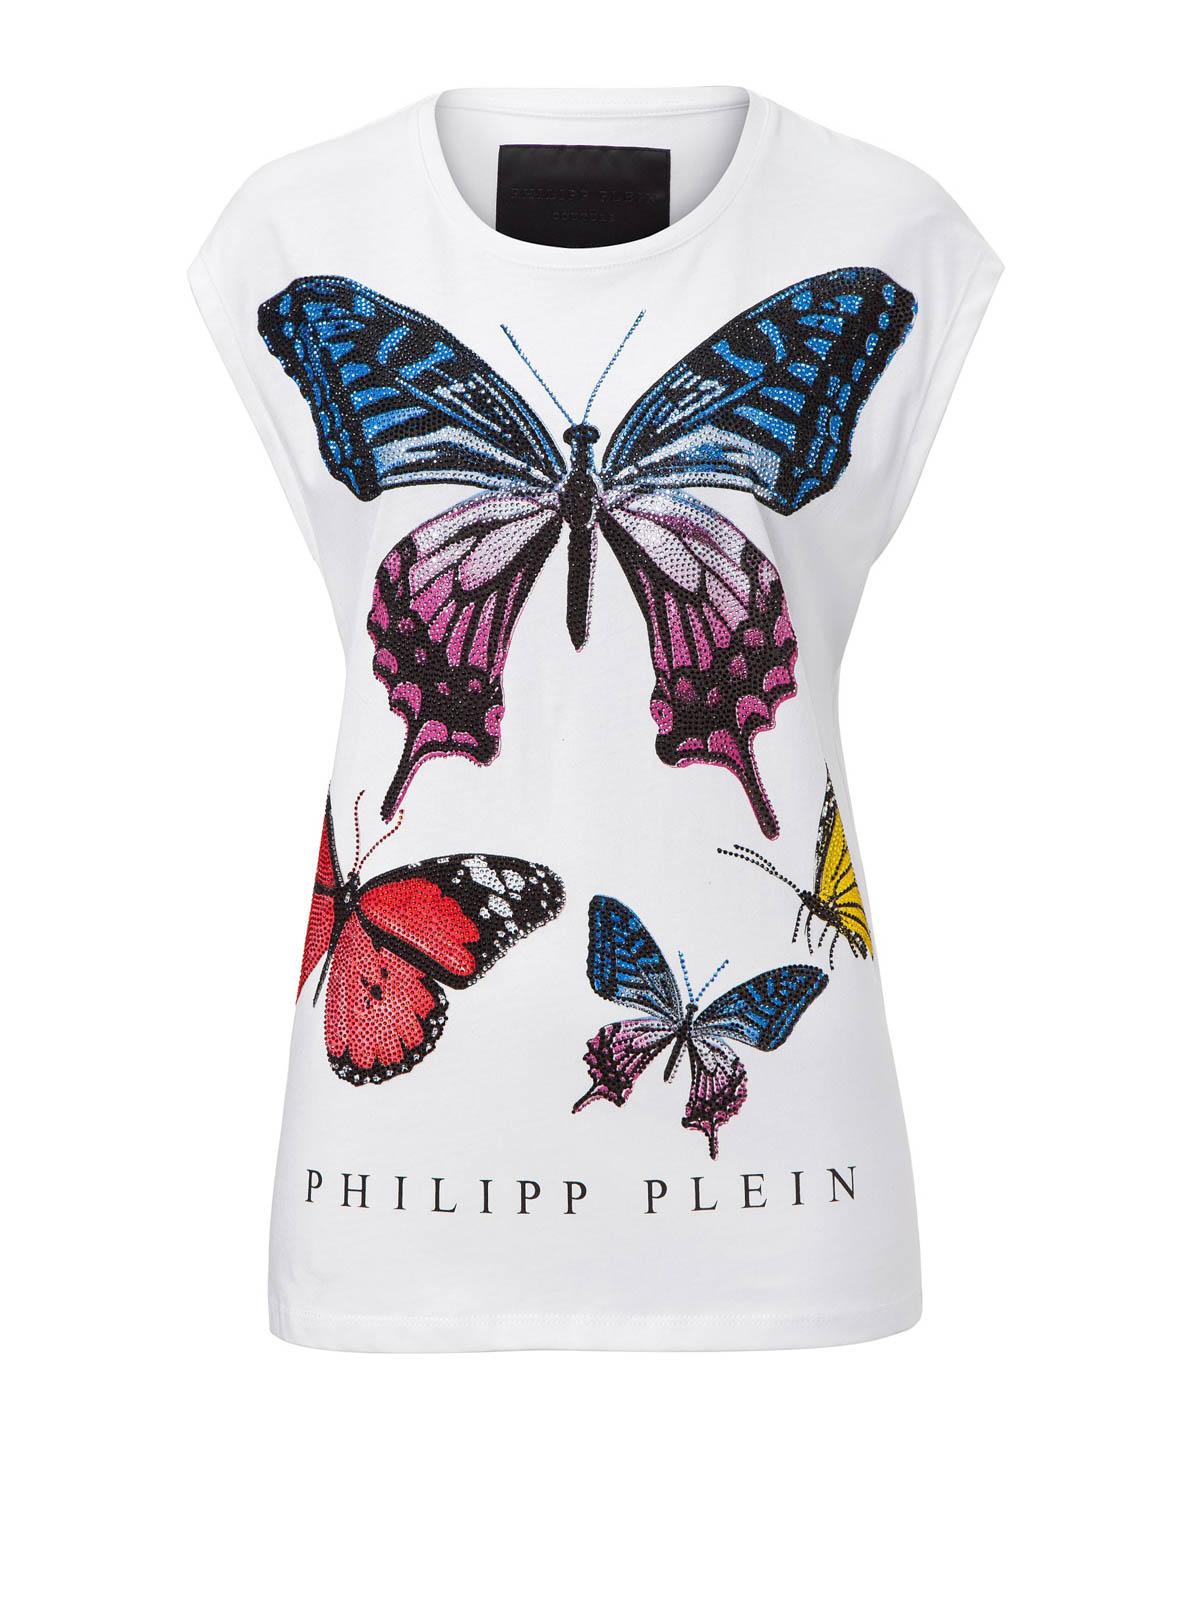 philipp plein tshirt butterfly in cotone tshirt